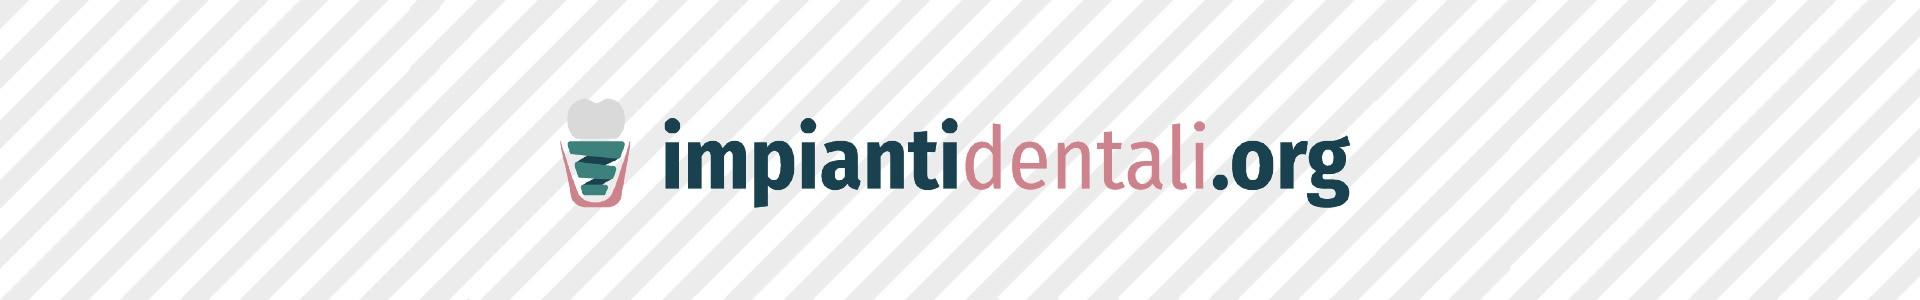 SIdP Impianti dentali.org